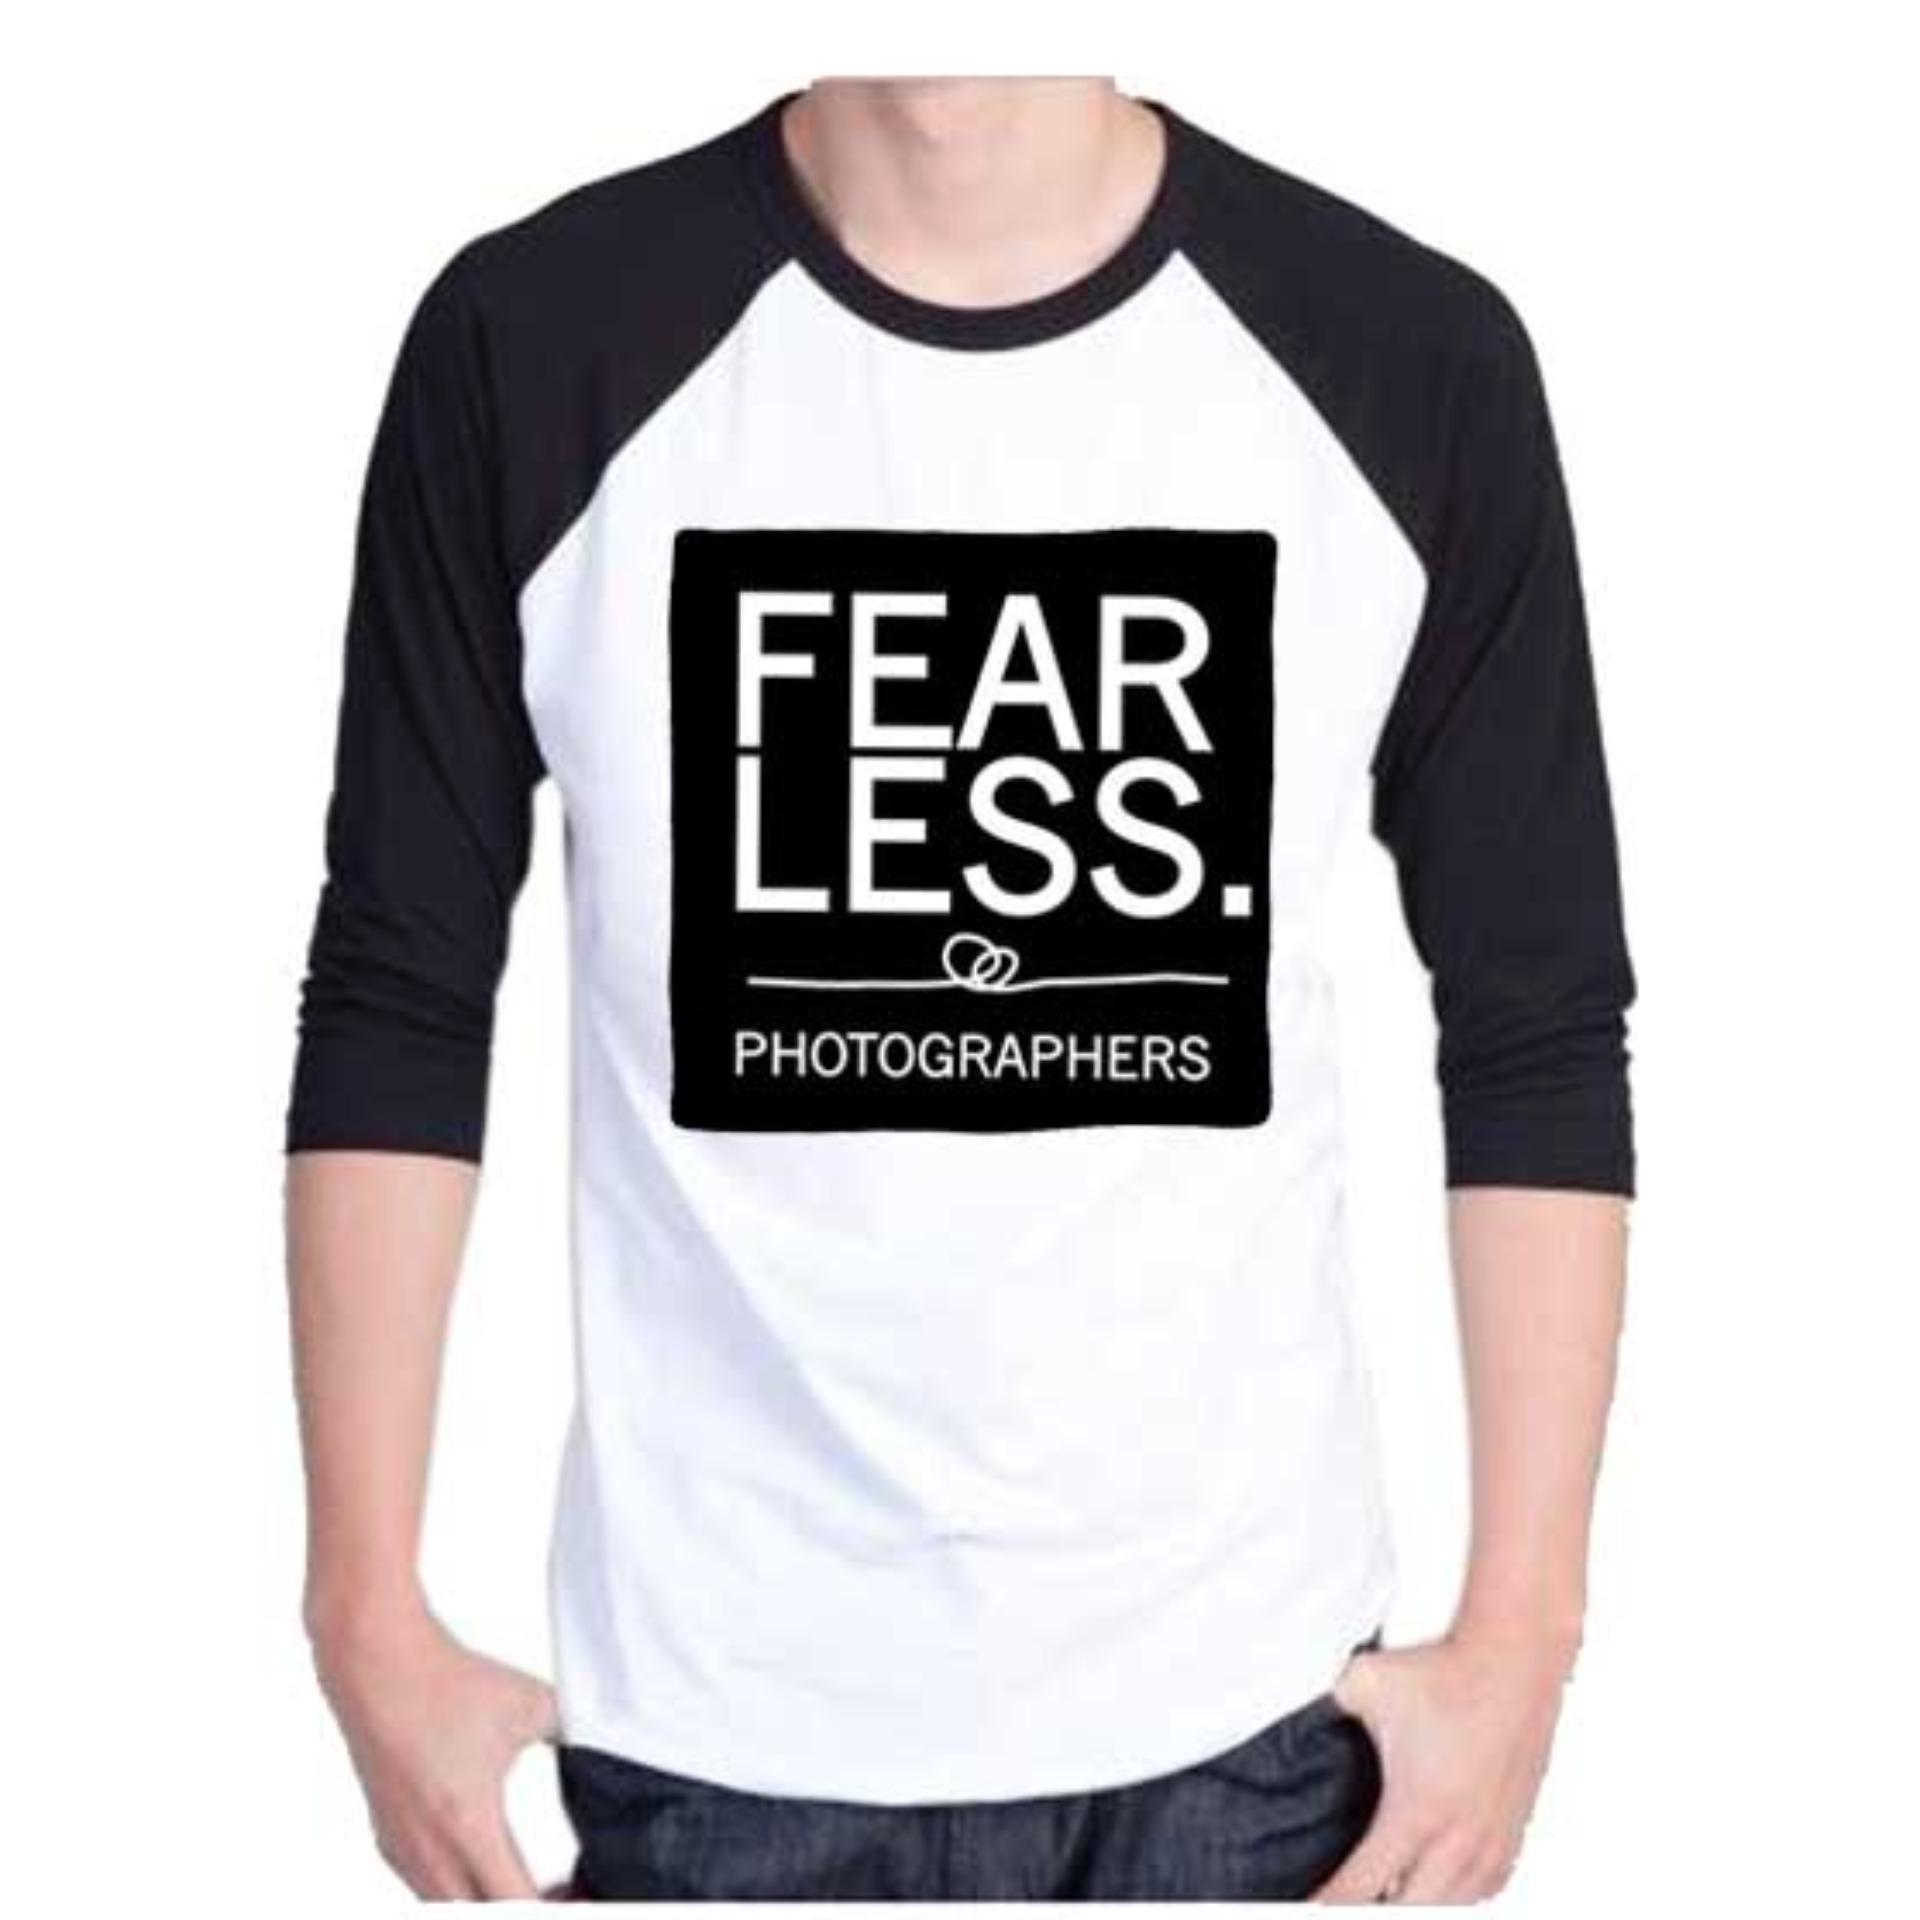 Sz Graphics T Shirt Pria Kaos Fashion Xtraordinary Obl Tshirt 238780061 Hitam Flash Sale Raglan Fearless Photographer